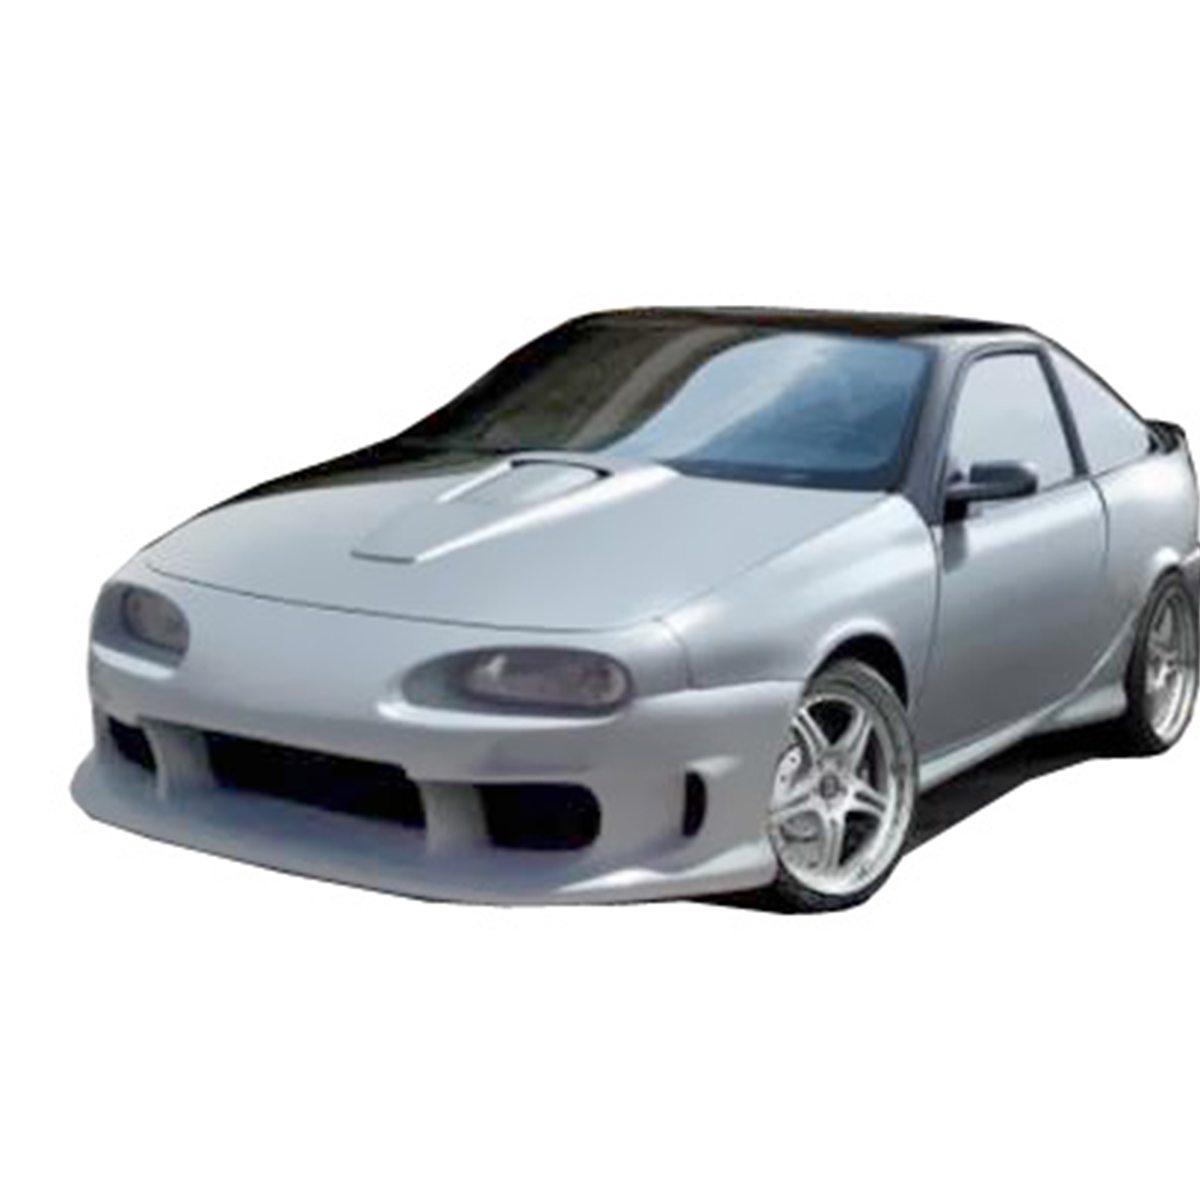 Nissan-100-NX-Frt-PCR034